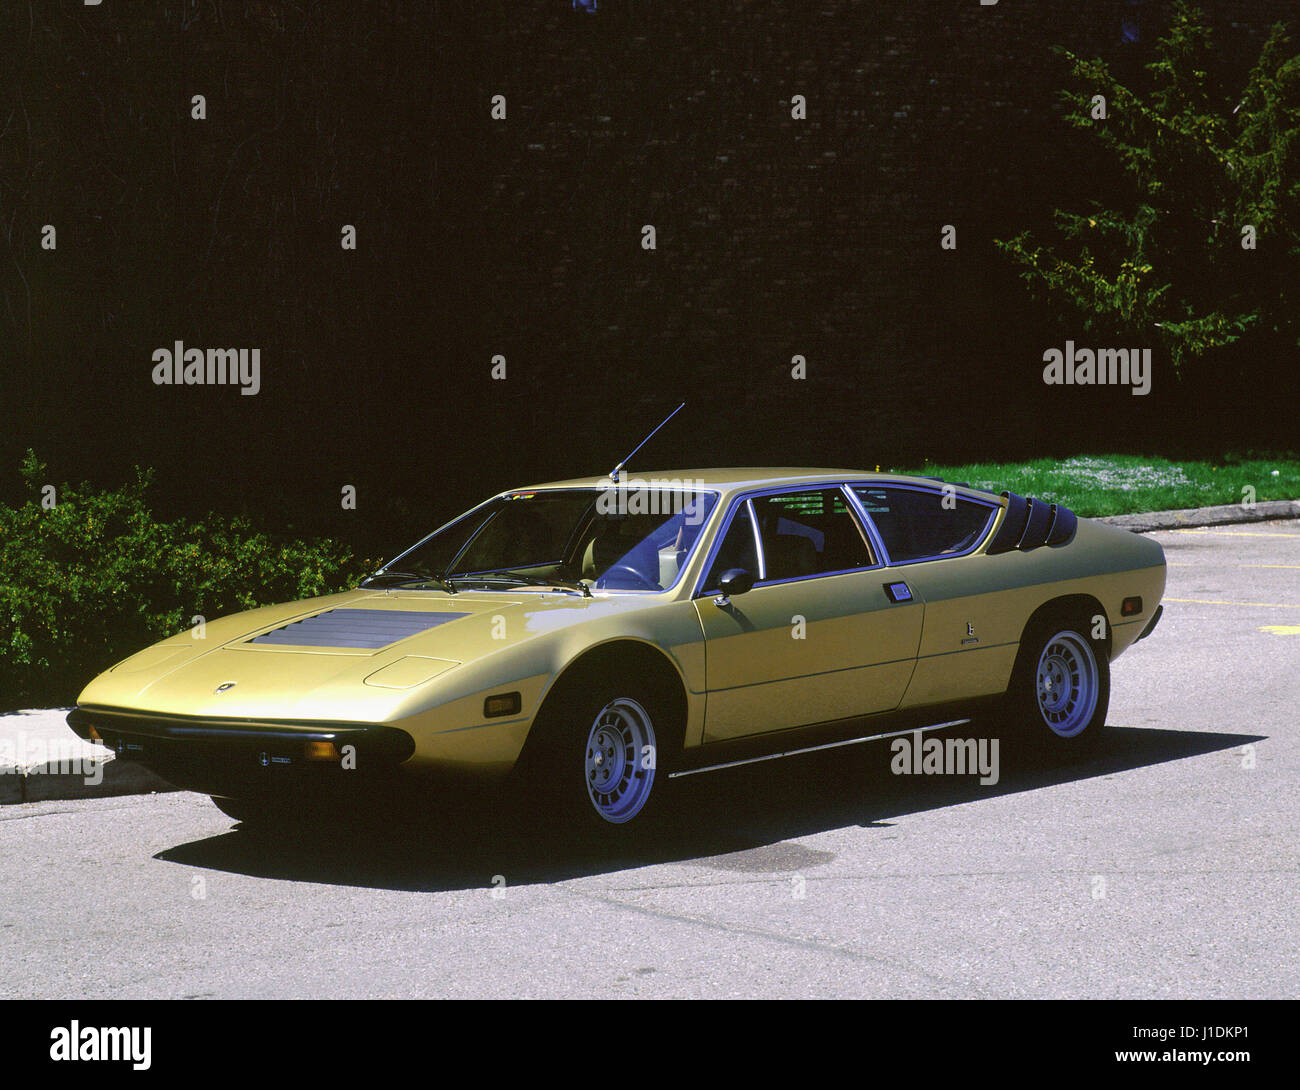 http://l7.alamy.com/comp/J1DKP1/1975-lamborghini-urraco-p300-J1DKP1.jpg